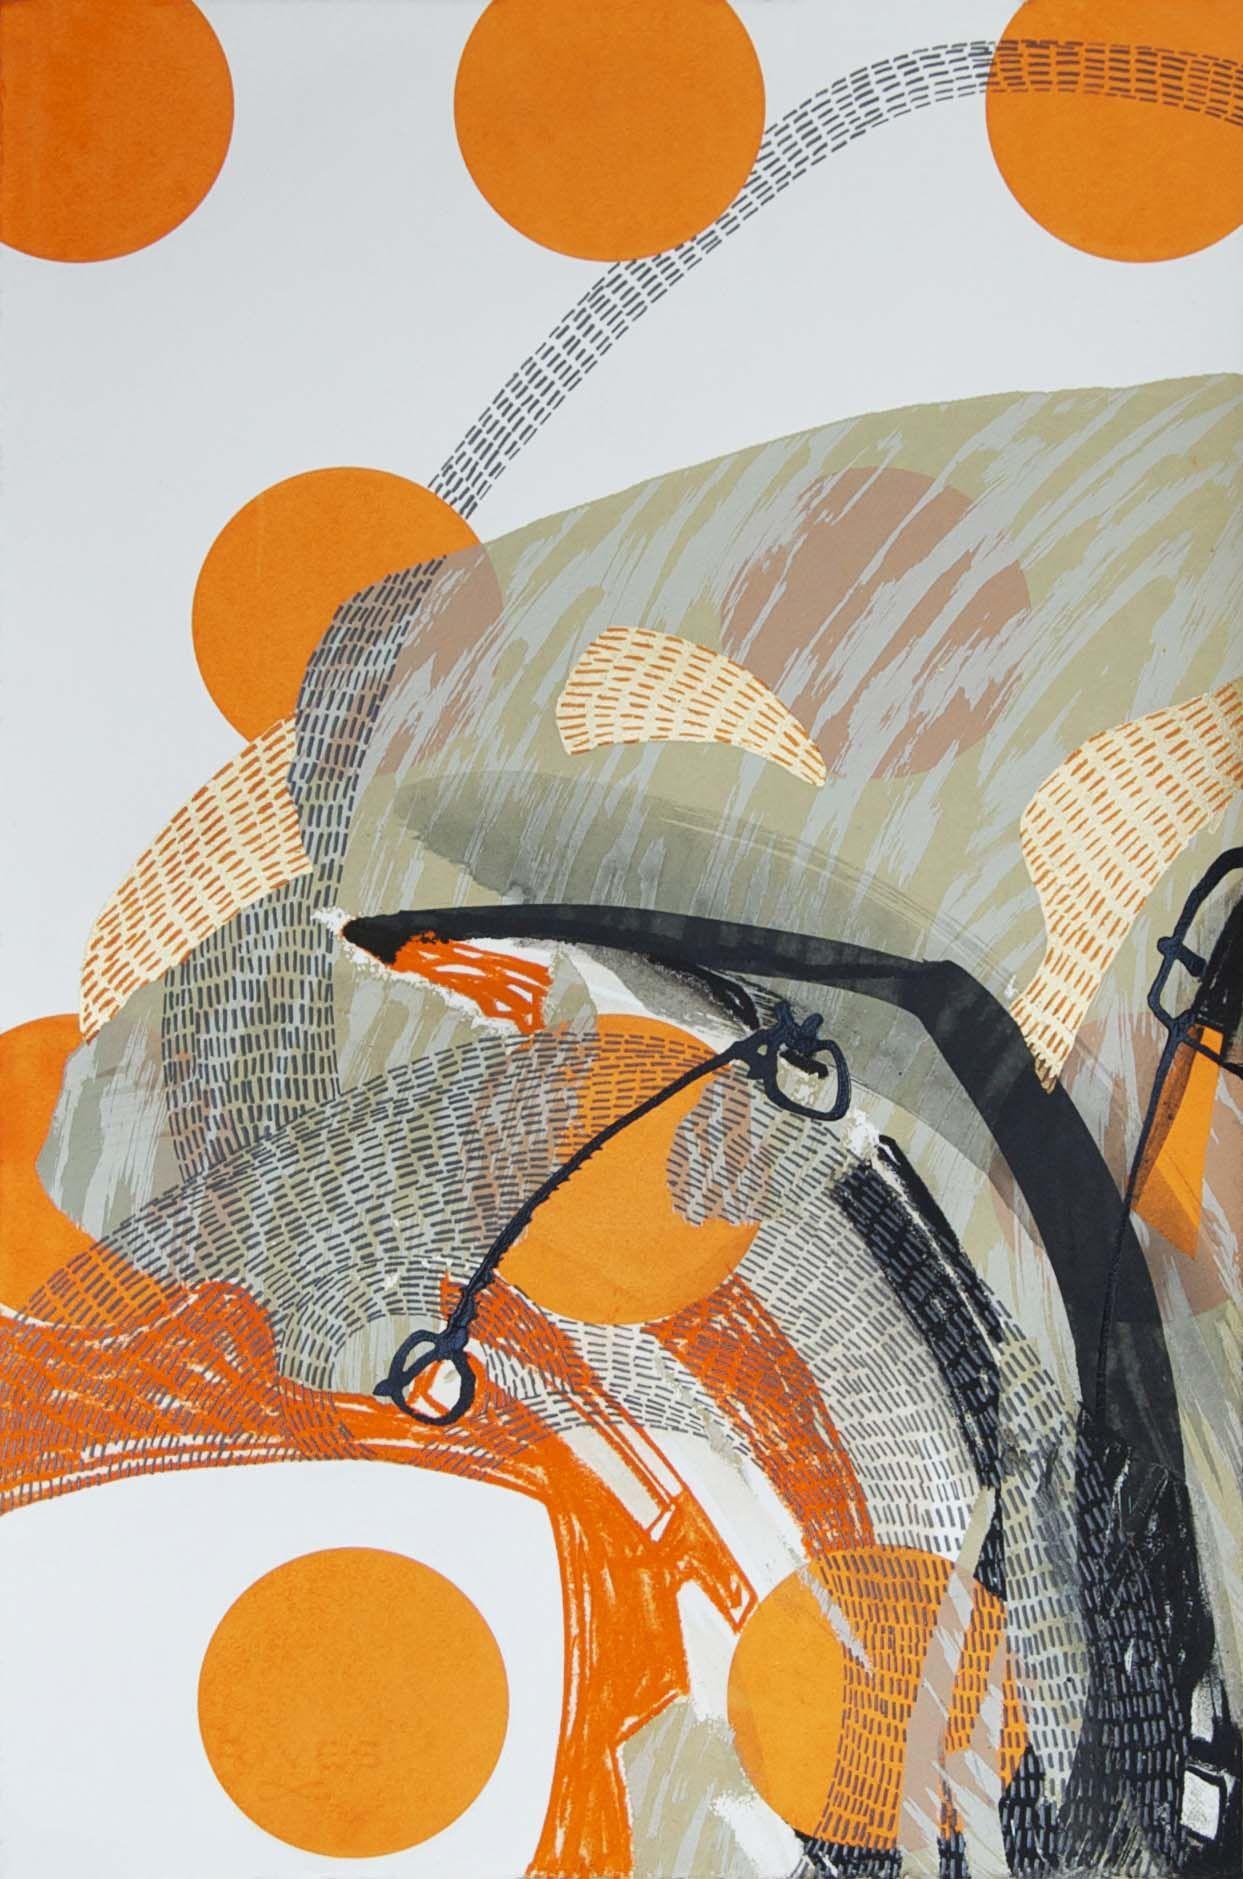 Steph Houstein: Bonescape 74, silkscreen & mixed media, 56x38cm